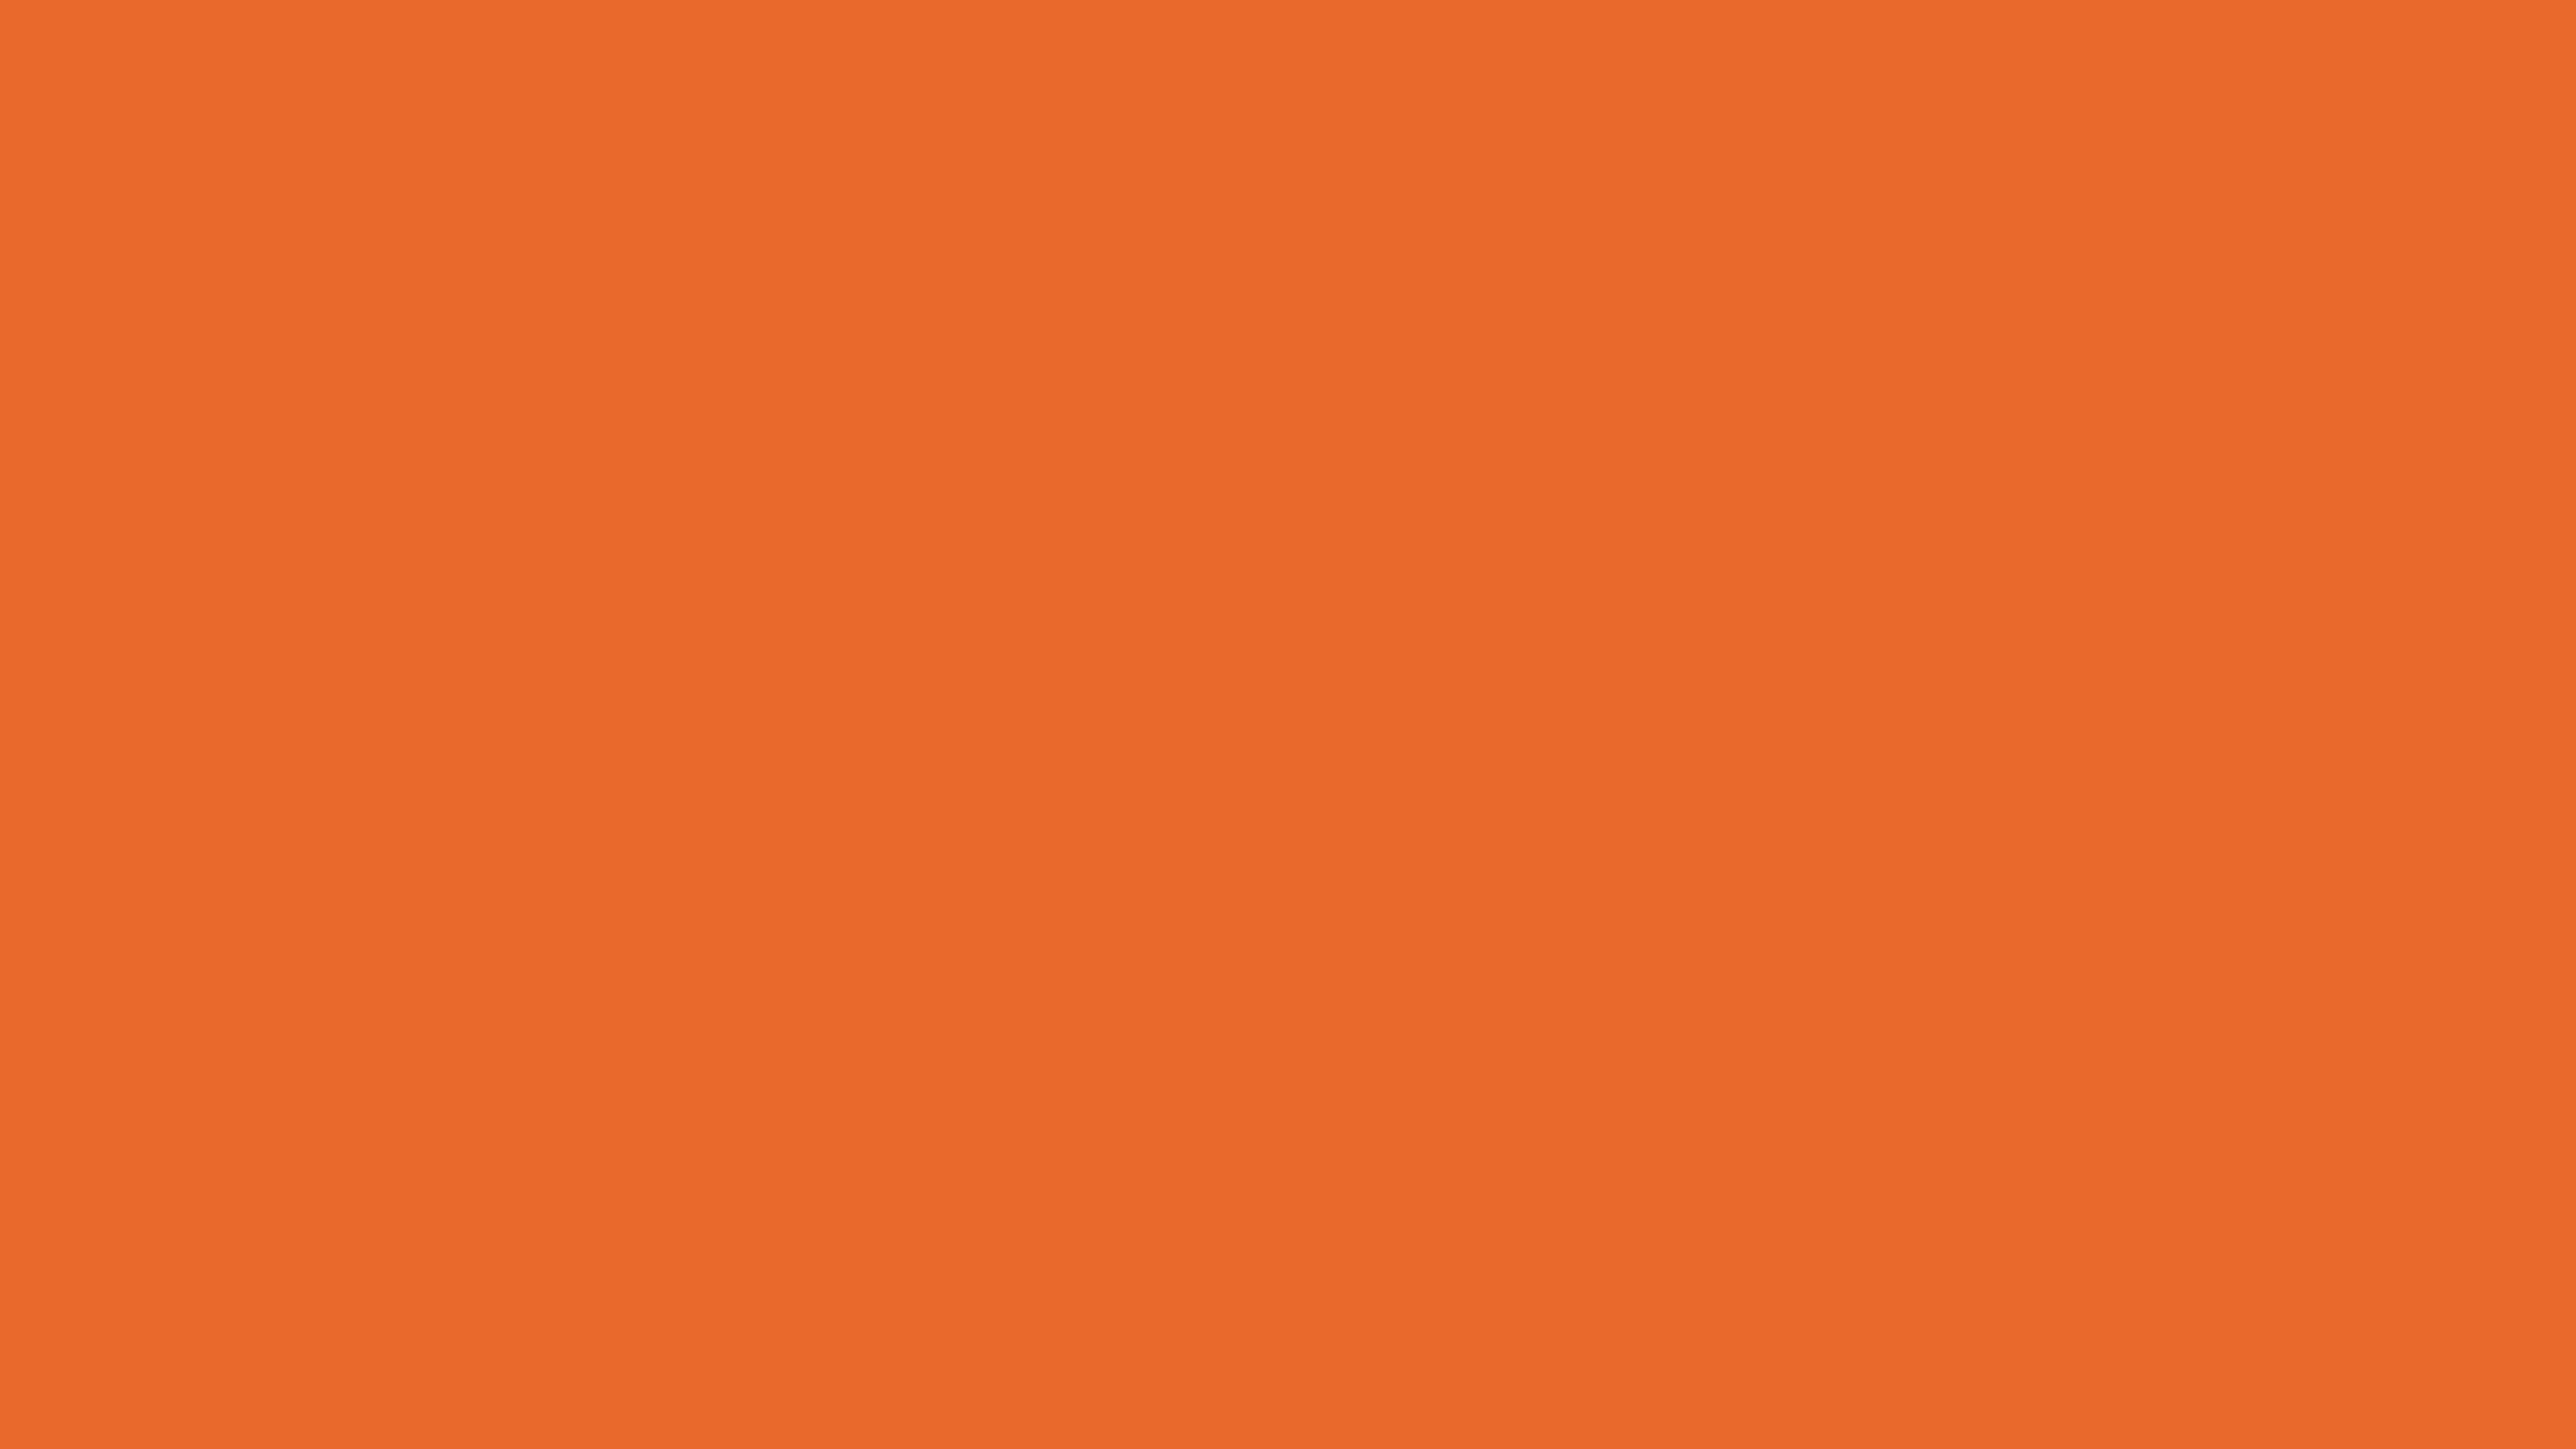 3840x2160 Deep Carrot Orange Solid Color Background